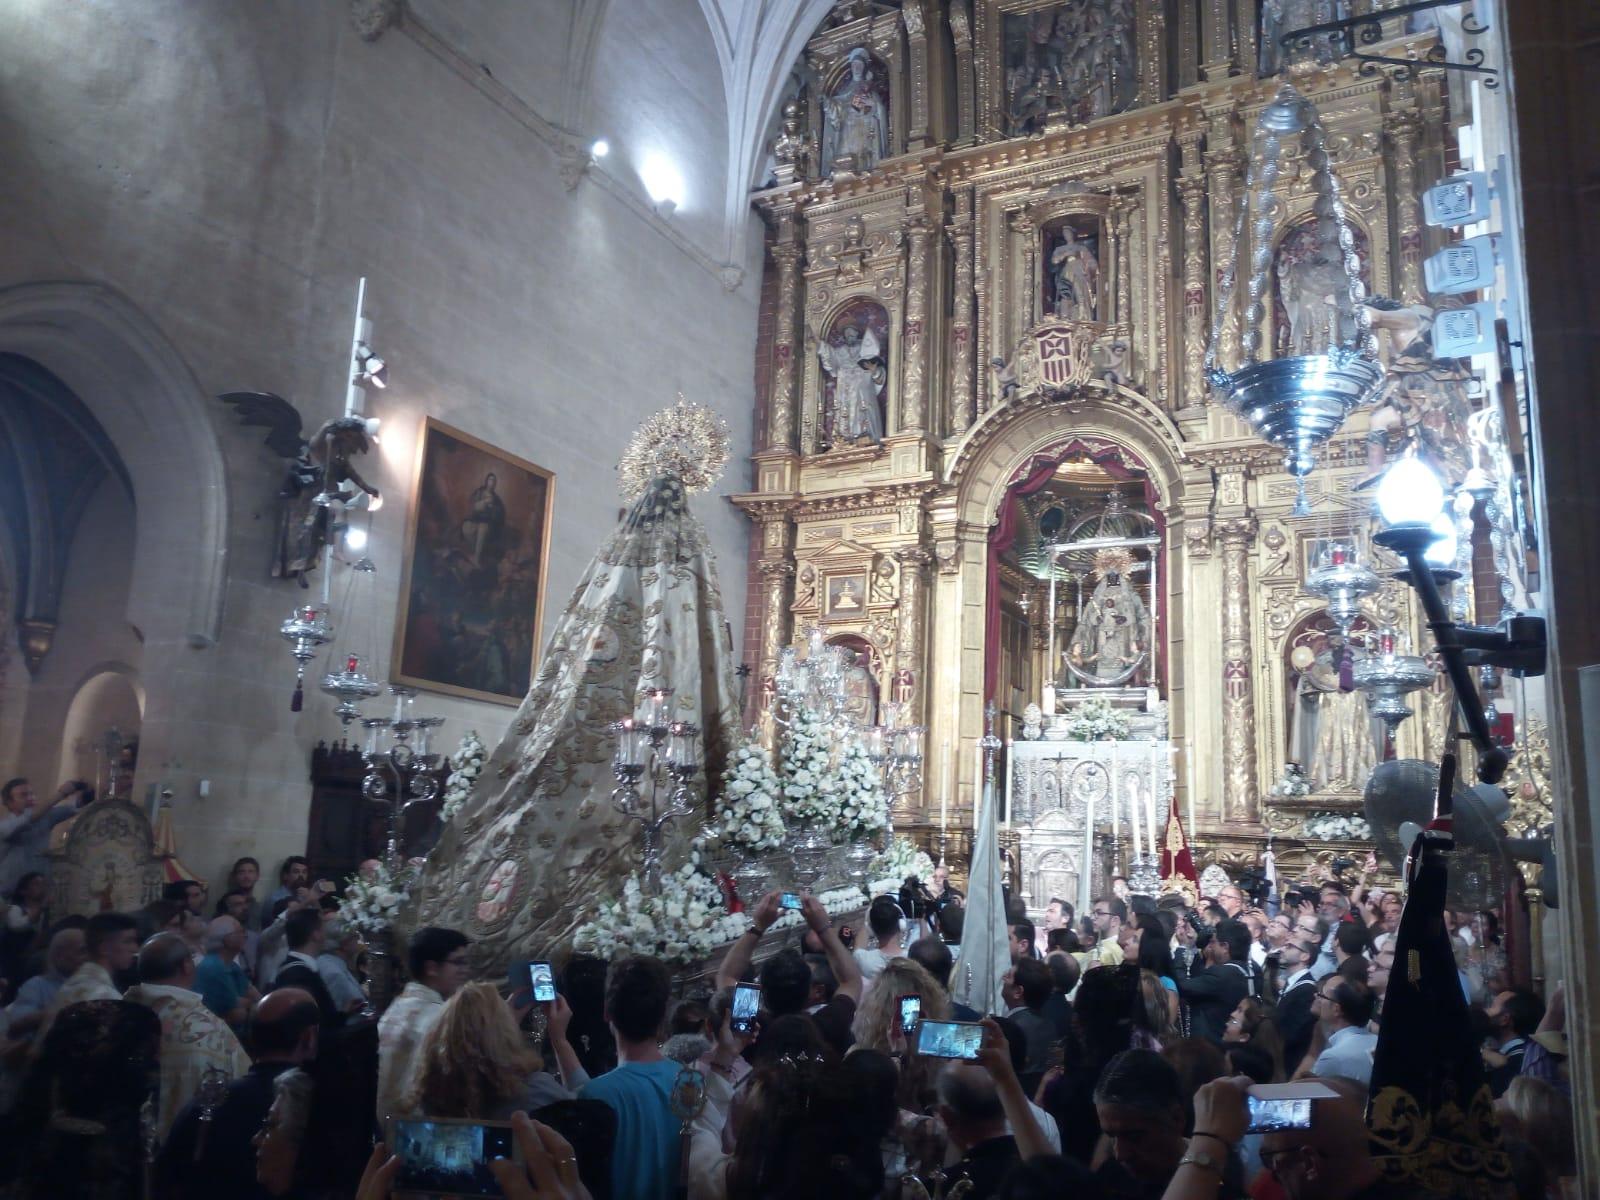 procesion Virgen del carmen 2018.jpeg